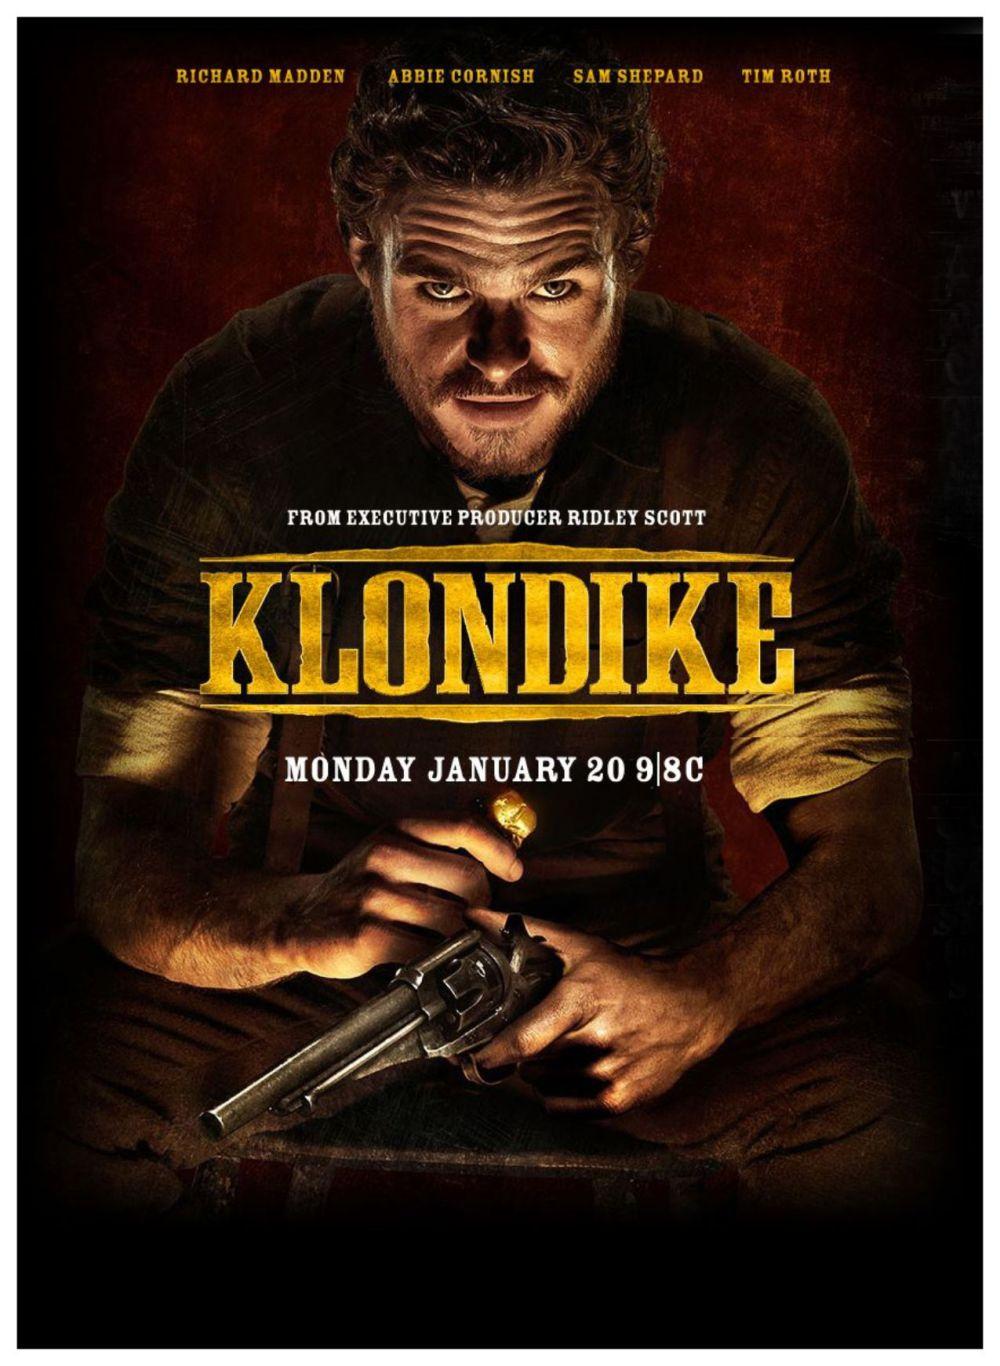 KLONDIKE poster